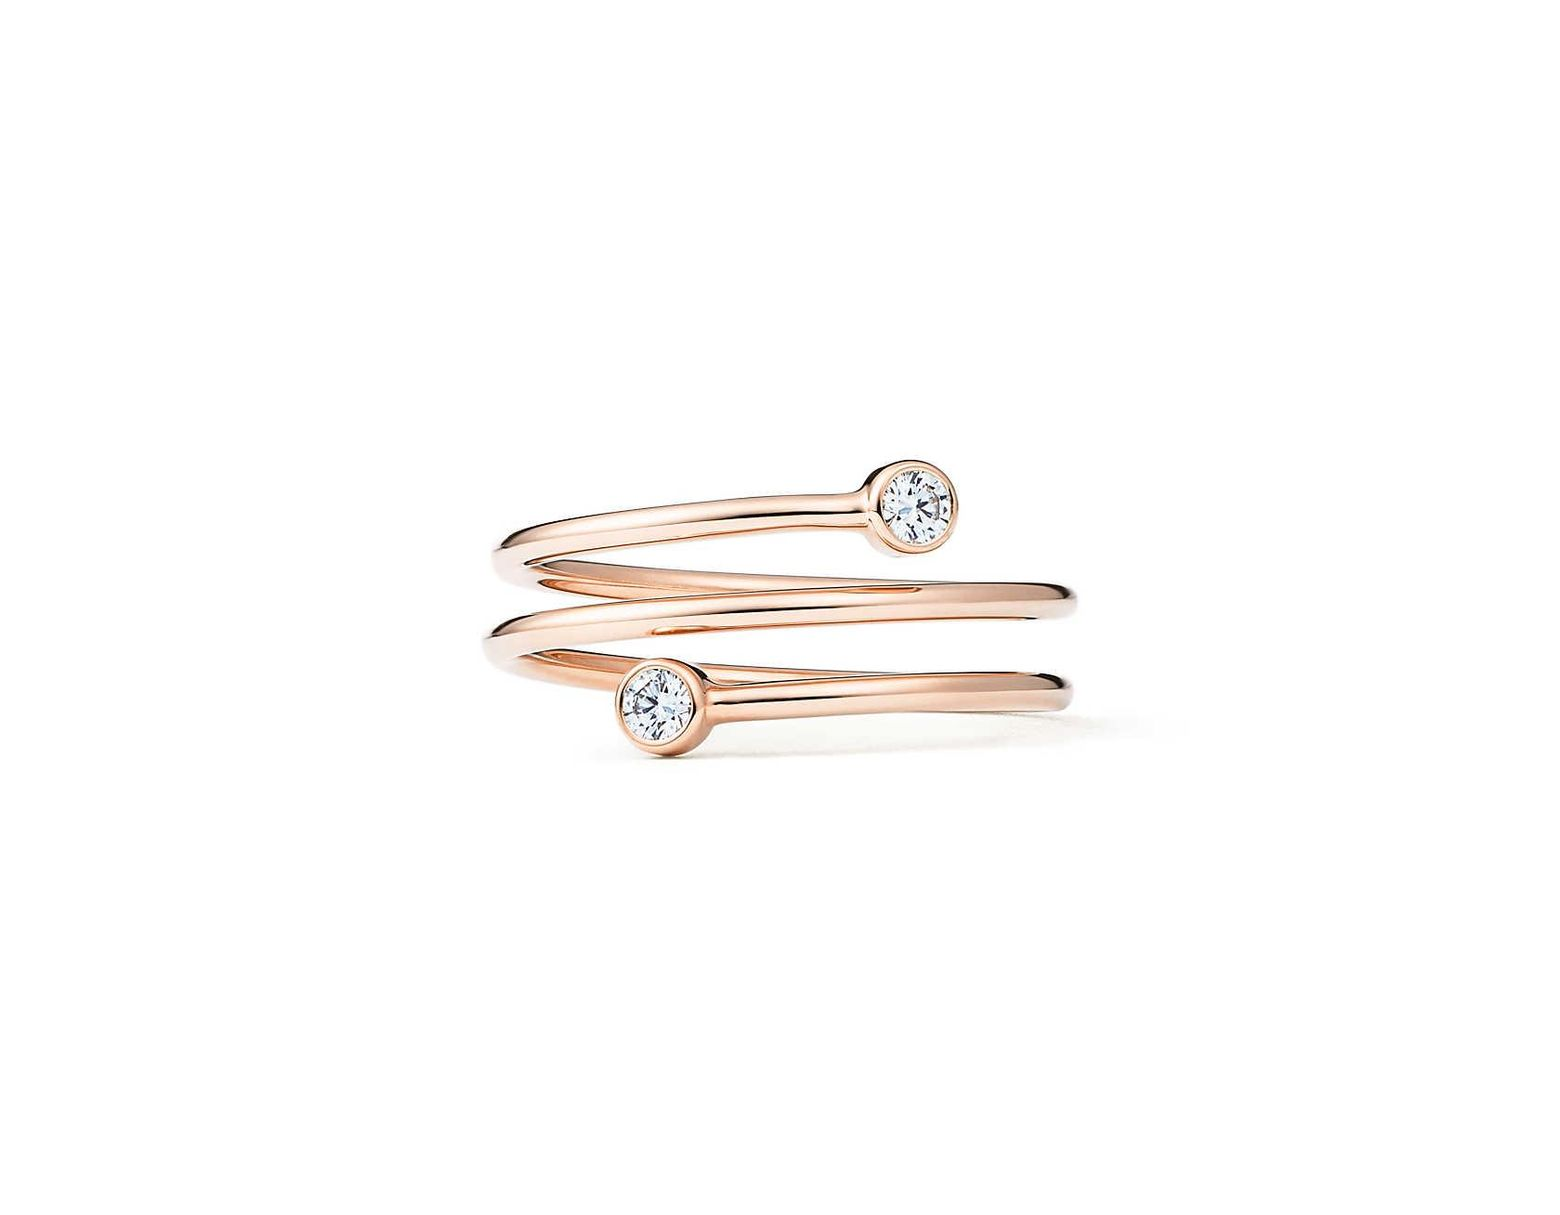 6c7952d44 Tiffany & Co. Elsa Peretti® Diamond Hoop Three-row Ring In 18k Rose Gold  With Diamonds - Size 8 - Lyst